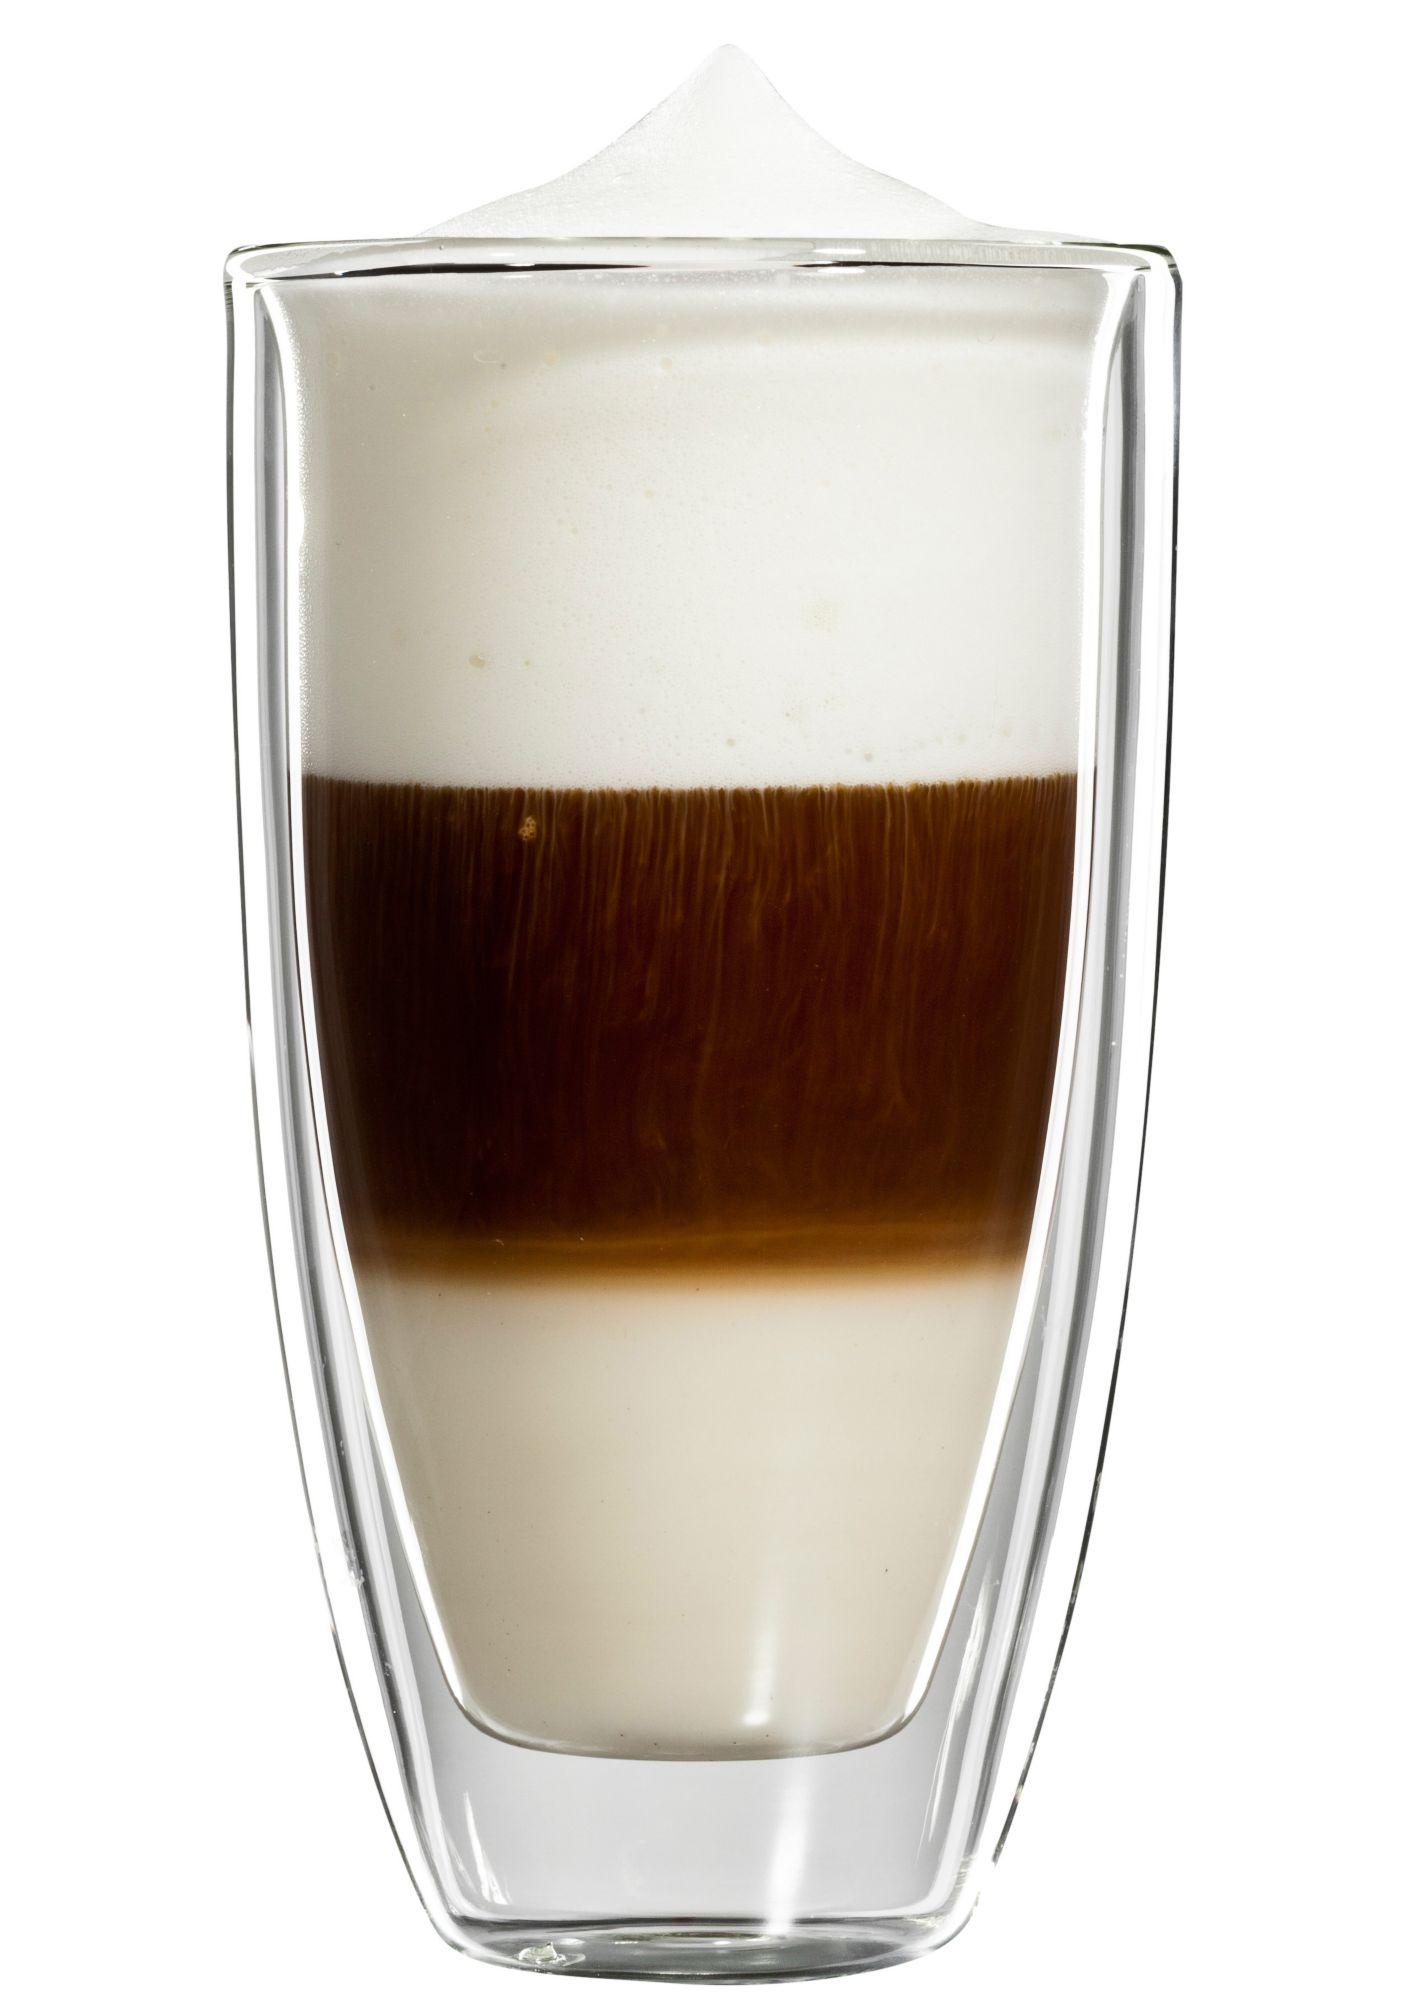 BLOOMIX bloomix Latte Macchiato-Glas, 4er Set, »Roma Grande«, 350 ml